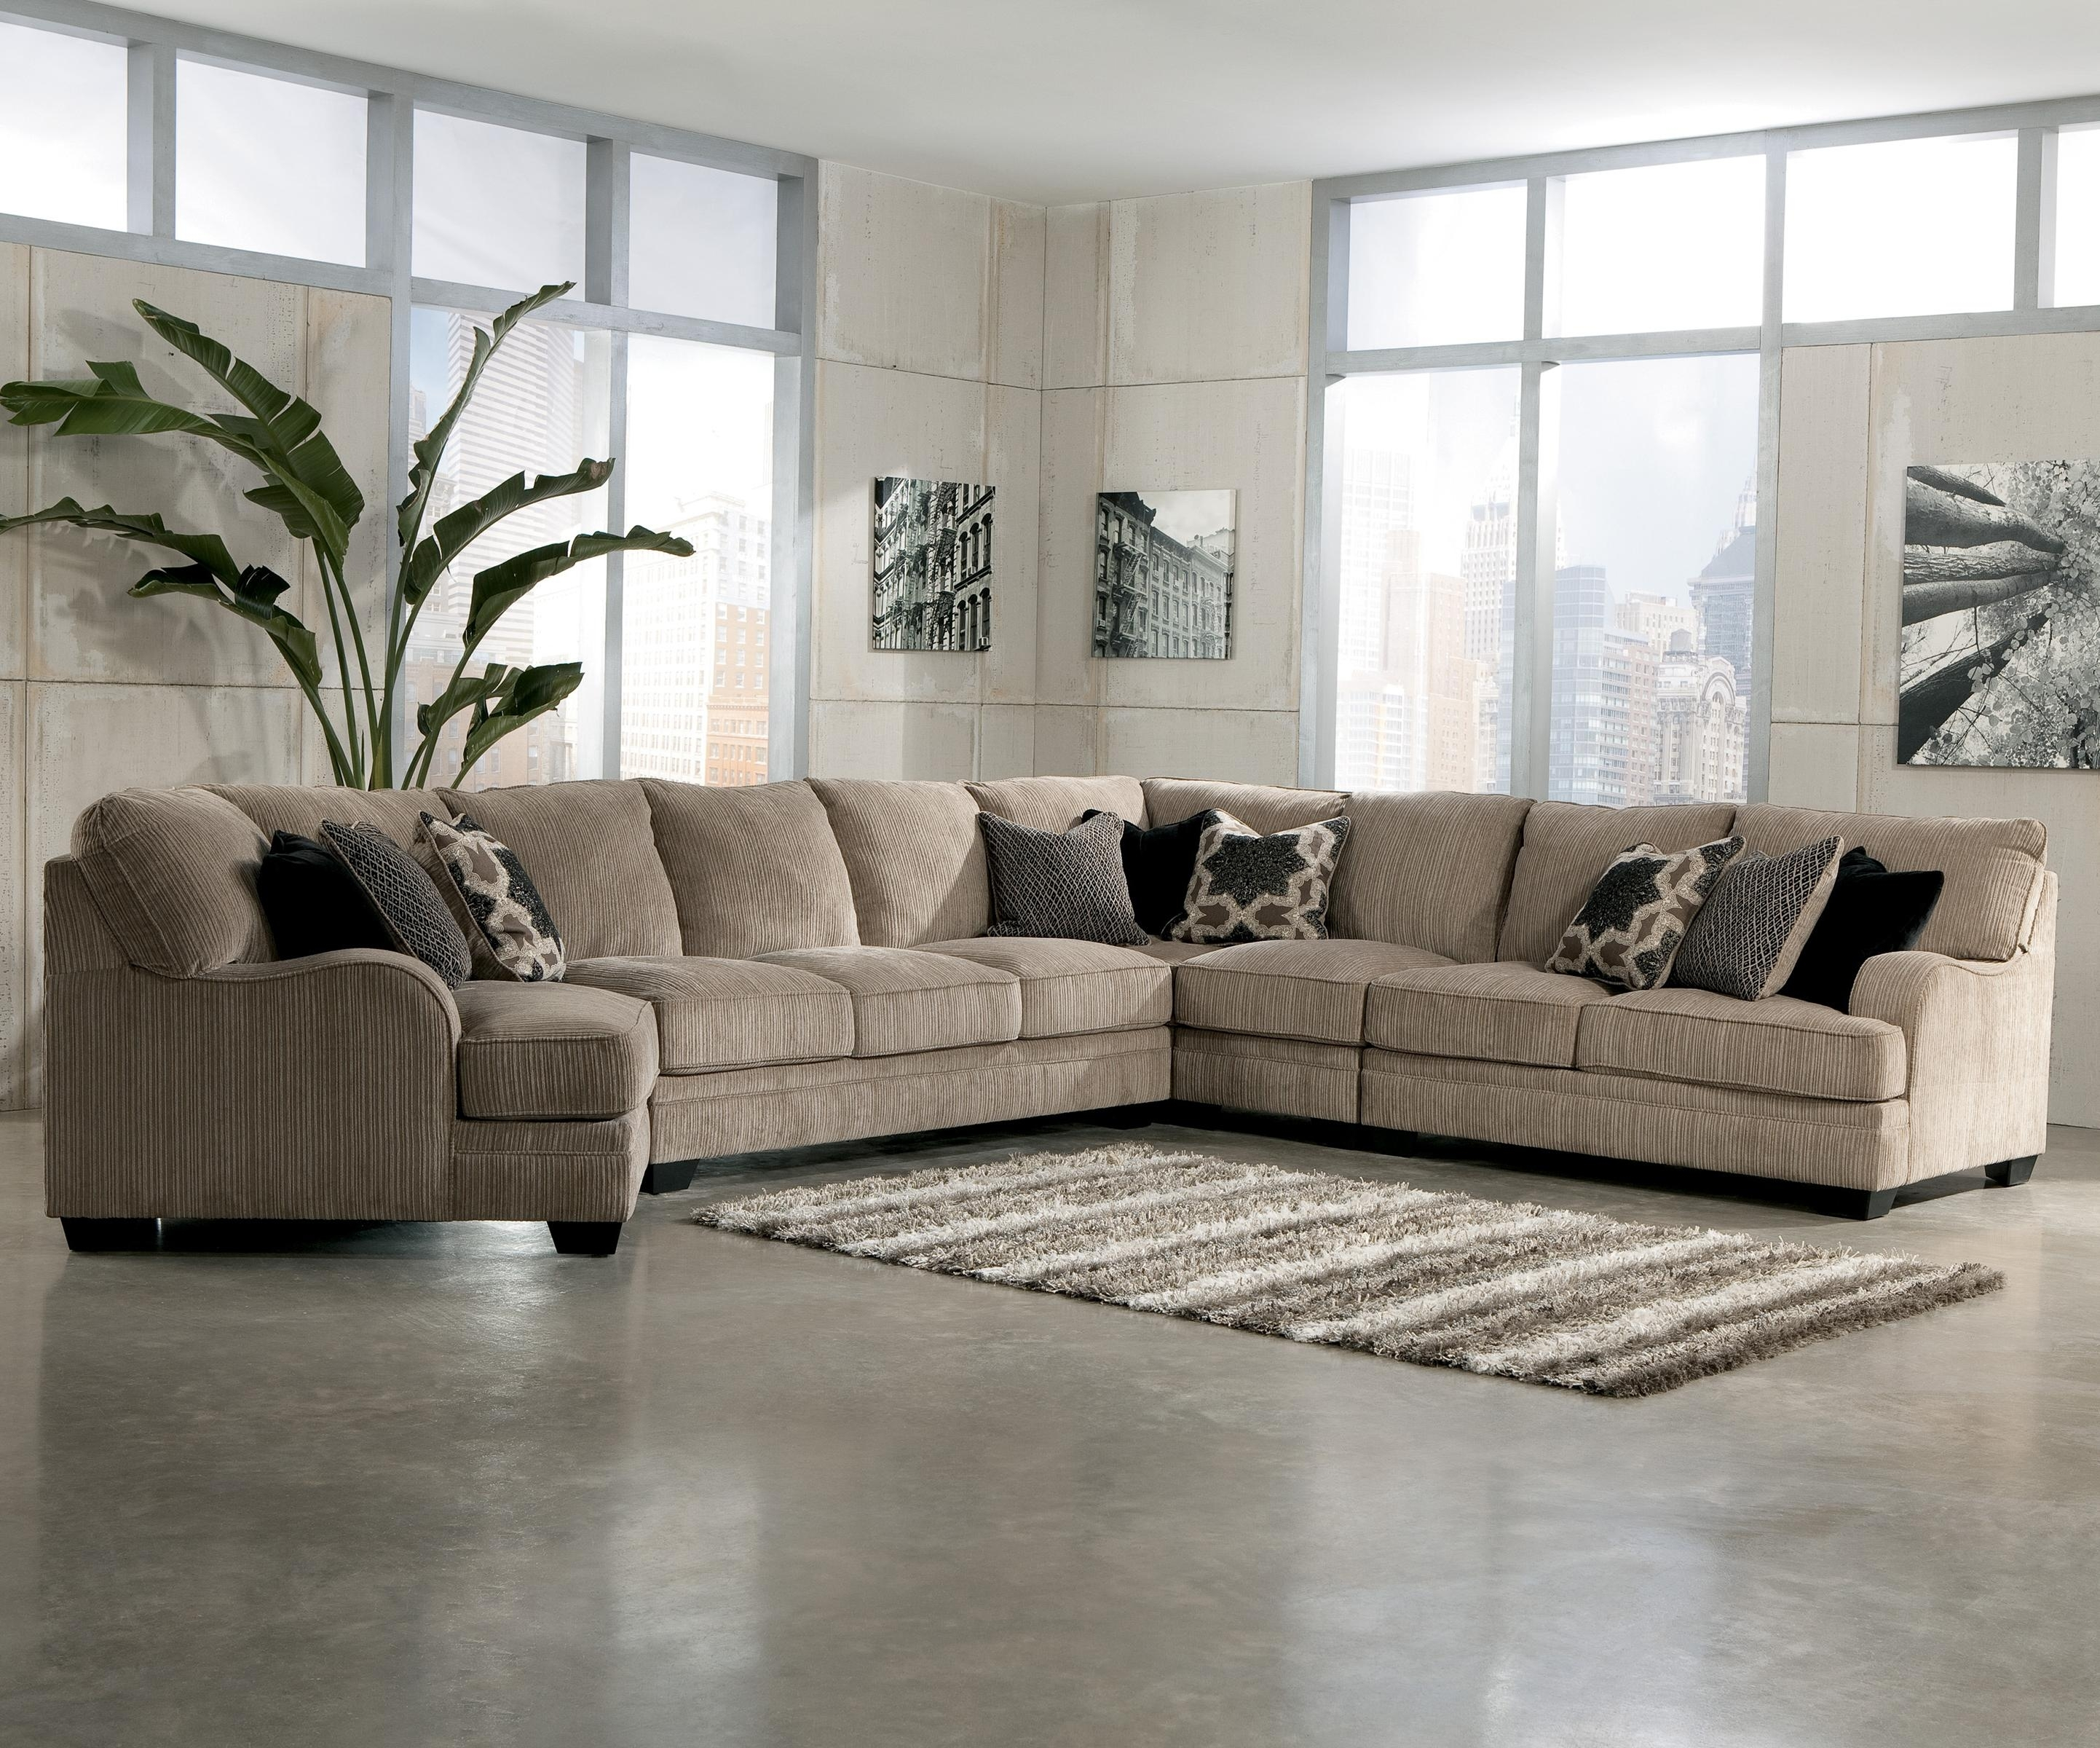 Signature Designashley Katisha – Platinum 5 Piece Sectional Sofa With Pittsburgh Sectional Sofas (Image 6 of 10)